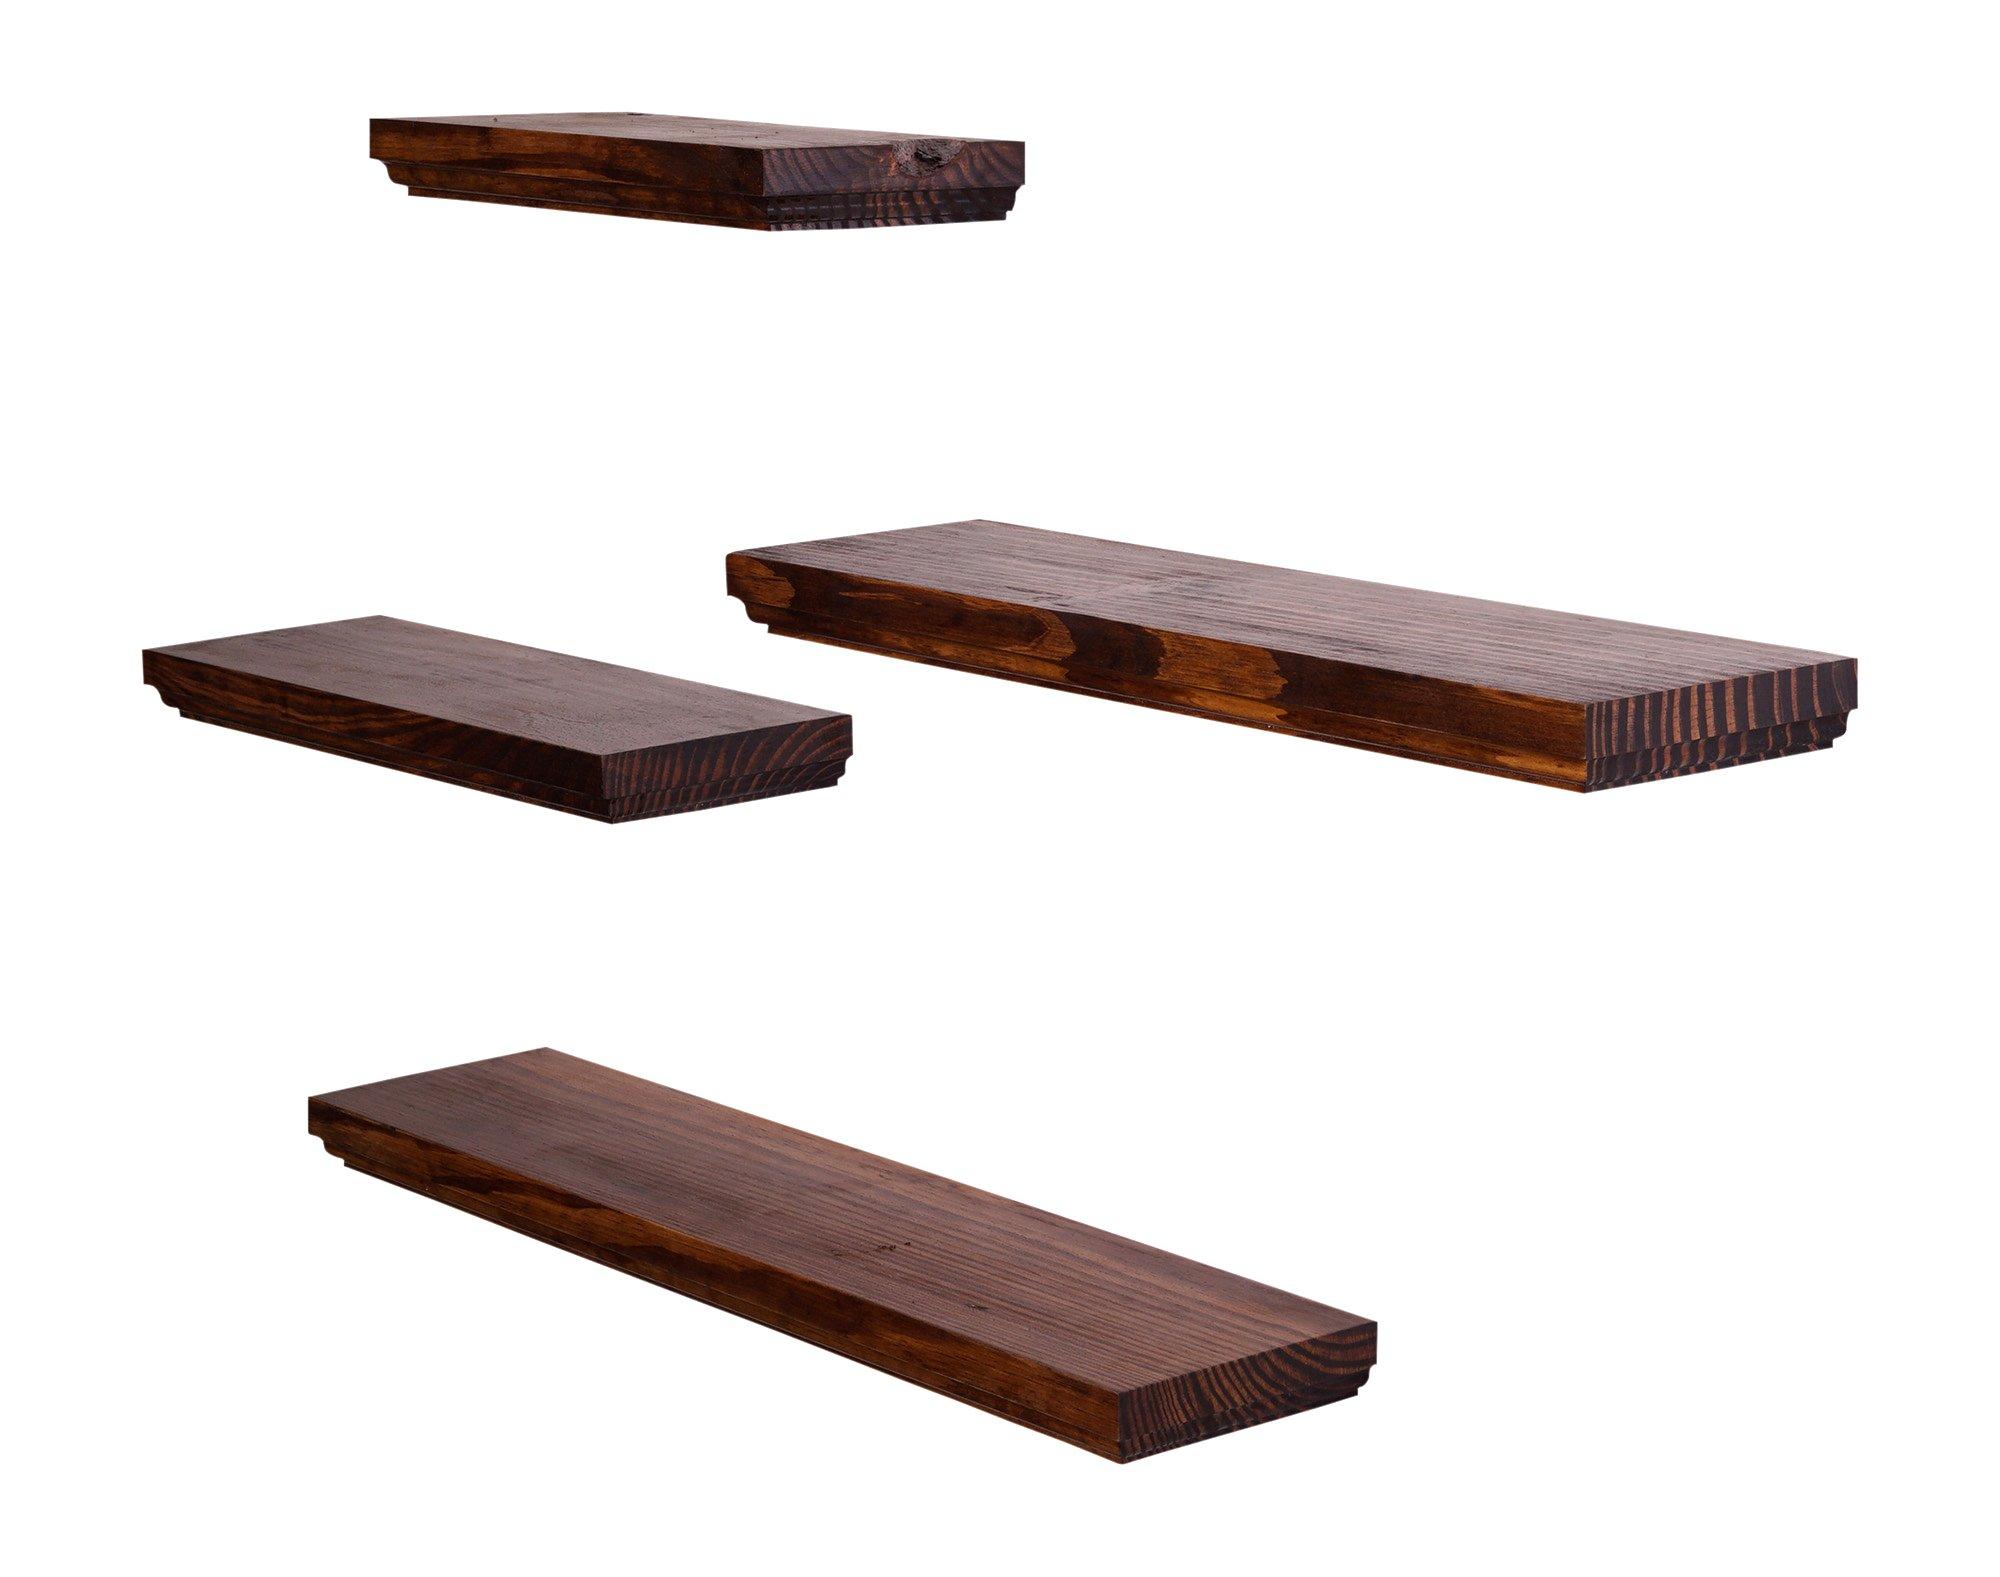 DAKODA LOVE Routed Edge Floating Shelves, USA Handmade, Clear Coat Finish, 100% Countersunk Hidden Floating Shelf Brackets, Beautiful Grain Pine Wood Wall Decor (Set of 4) (Bourbon) by DAKODA LOVE (Image #3)